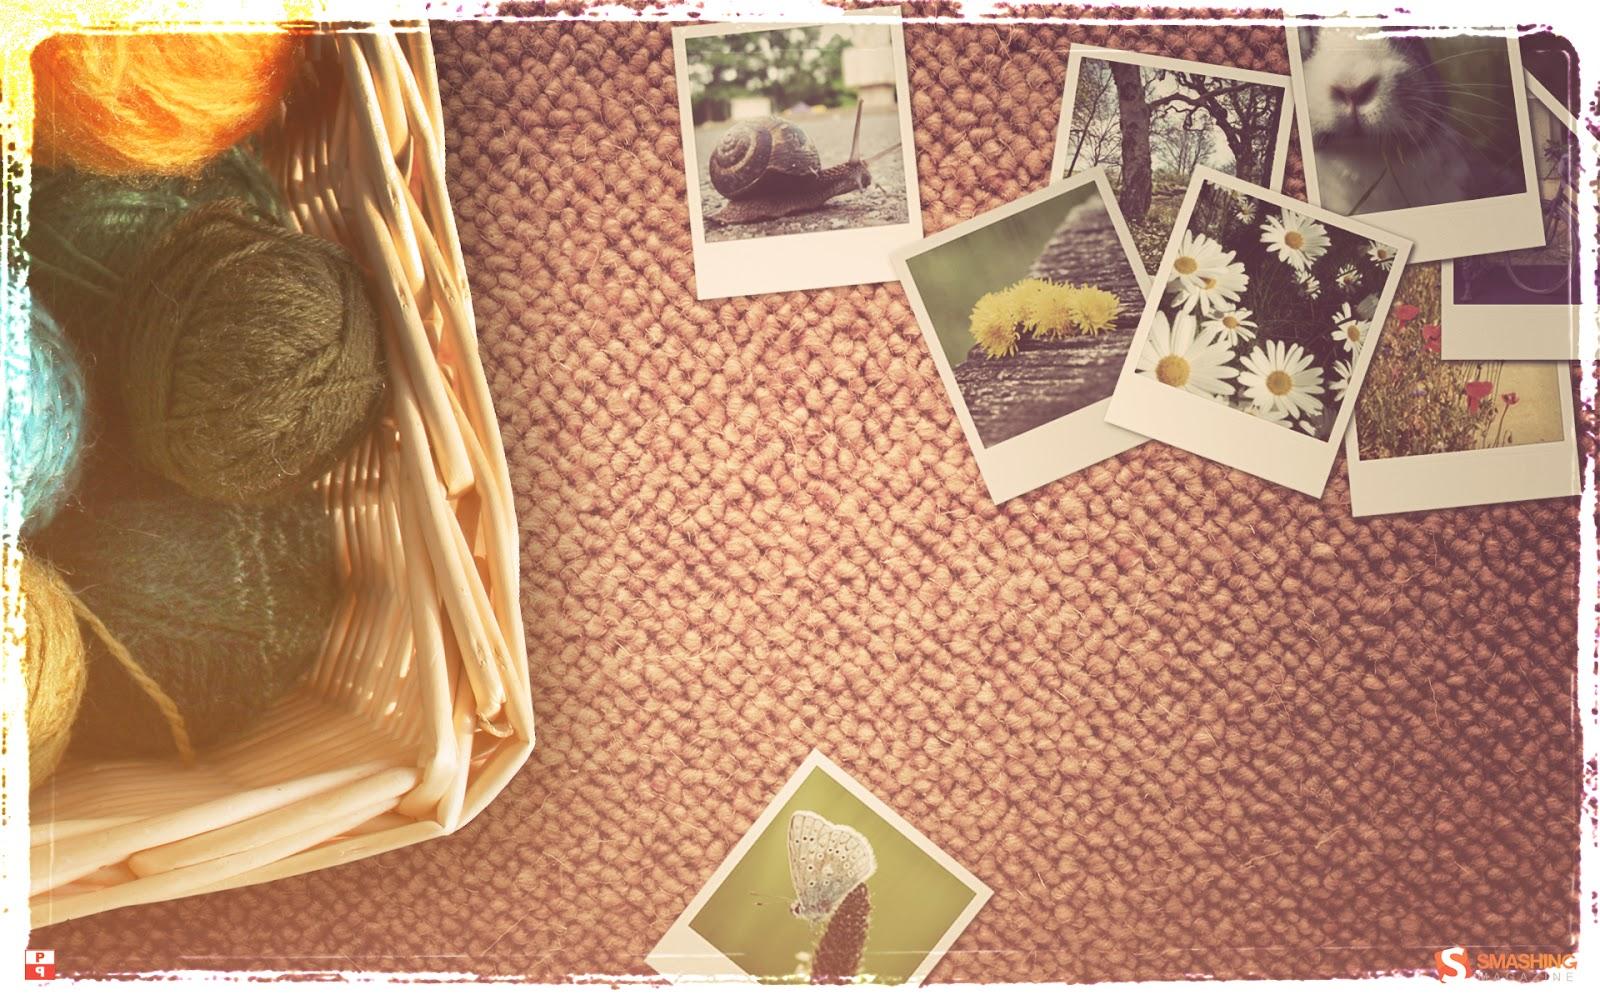 http://3.bp.blogspot.com/-6HS4HyS4Hys/T0zPRa9gNeI/AAAAAAAAEIY/55p-XujVlDc/s1600/Spring+Vintage+Wallpaper.jpg